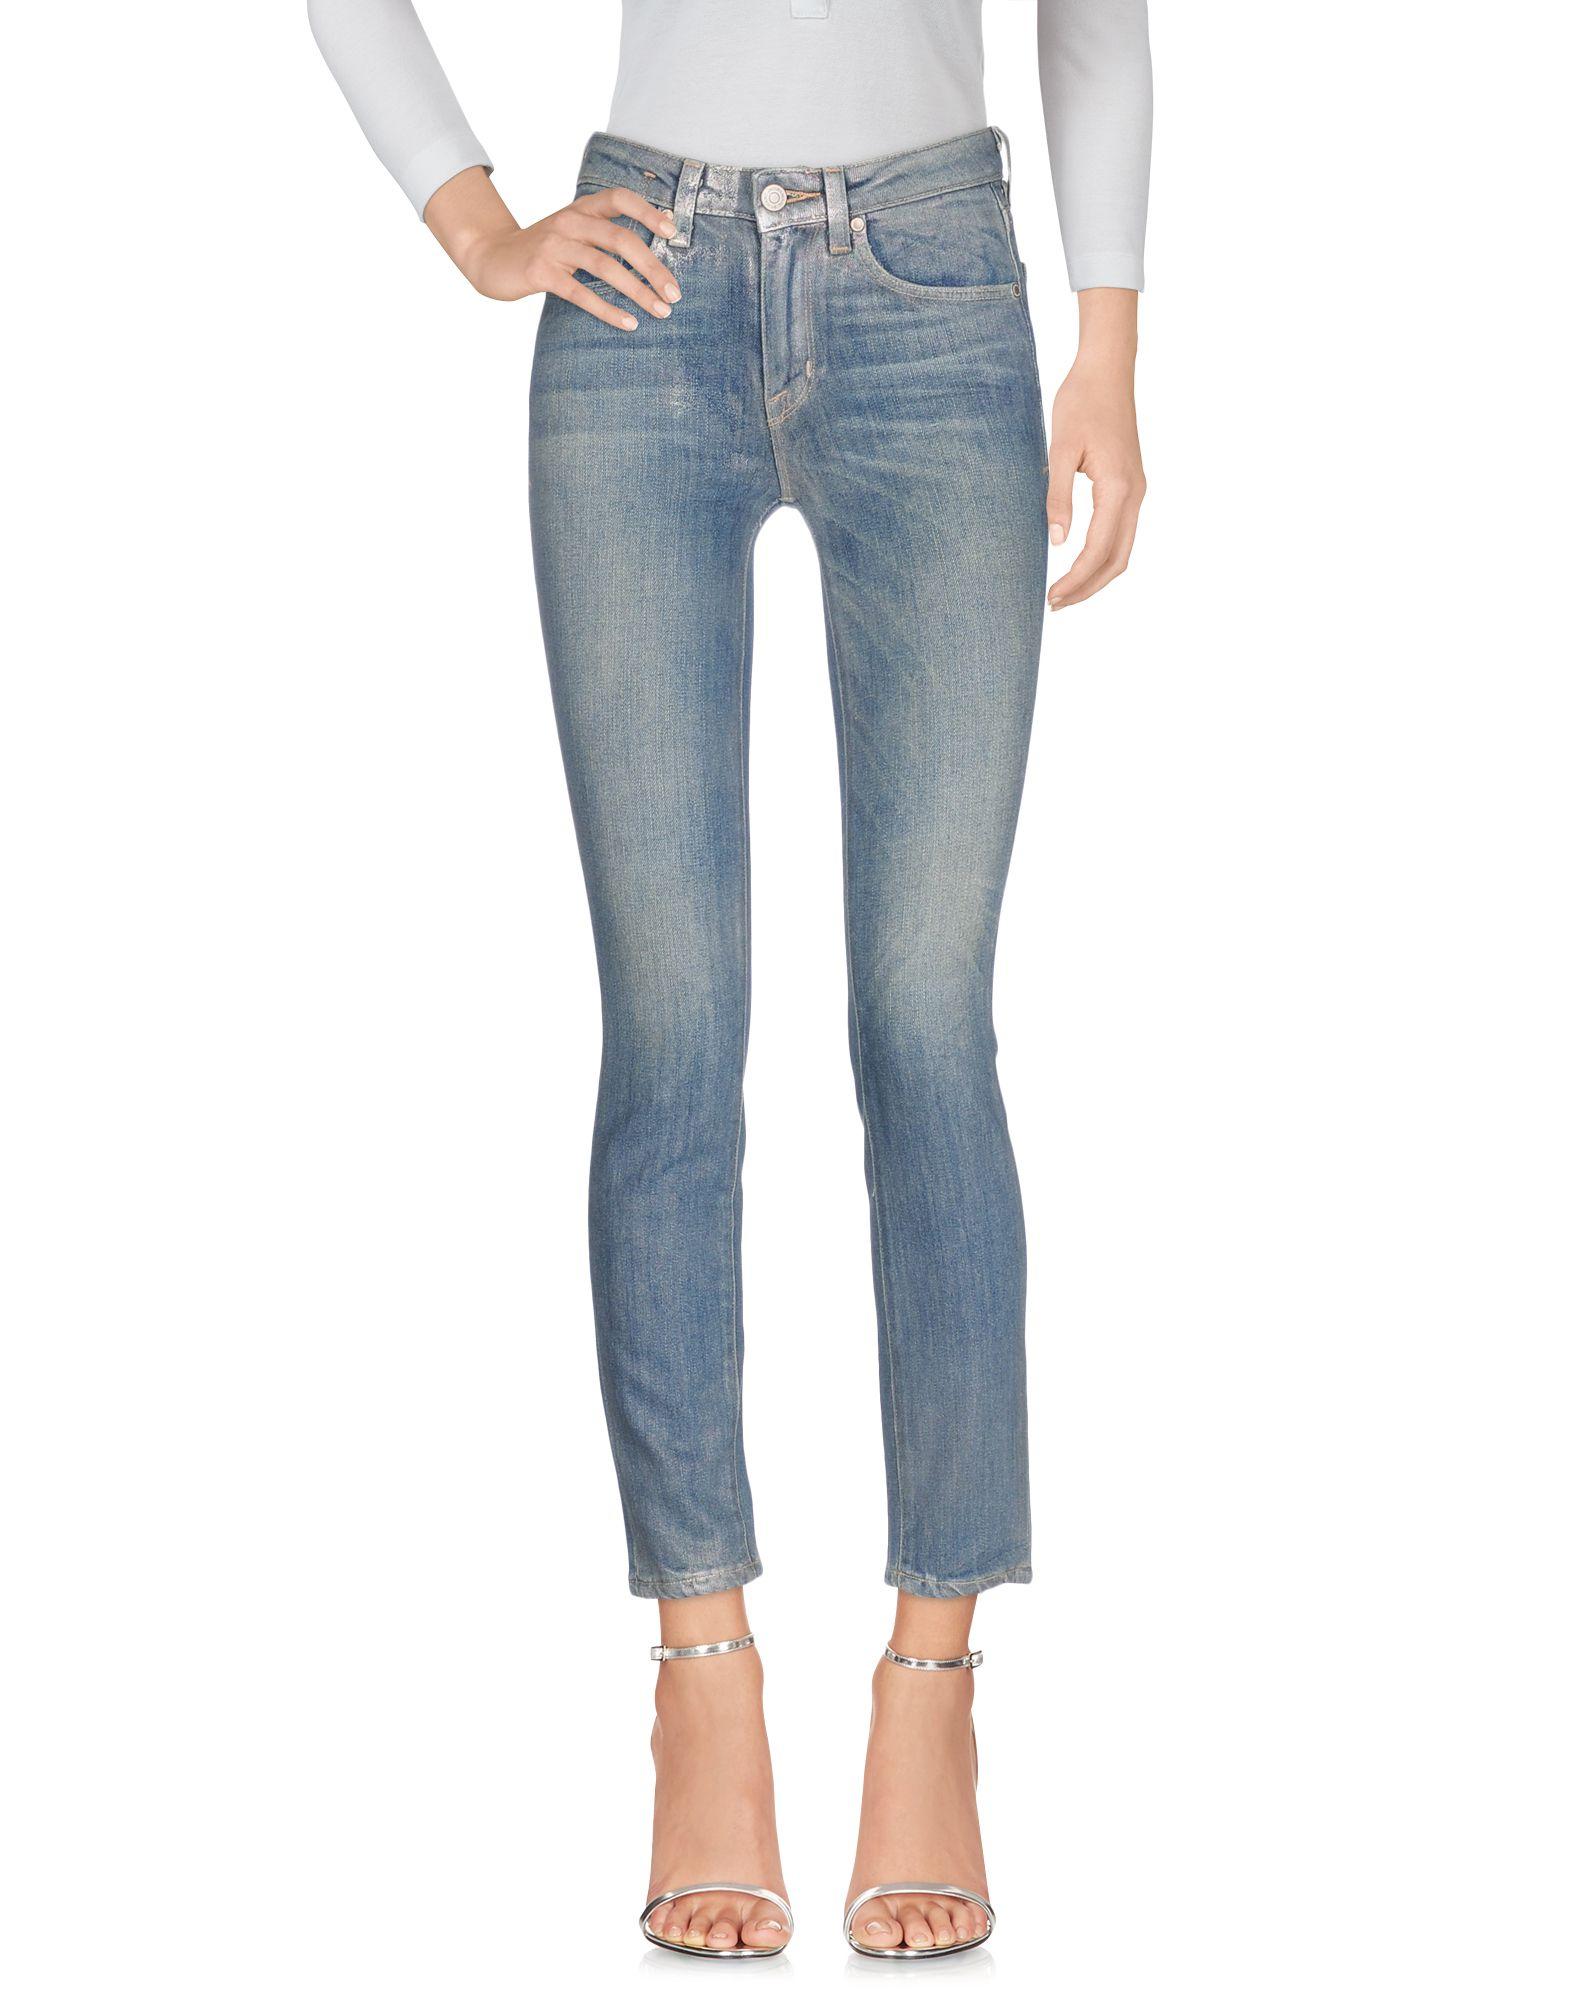 Pantaloni Jeans Marc By Marc Jacobs Donna - Acquista online su